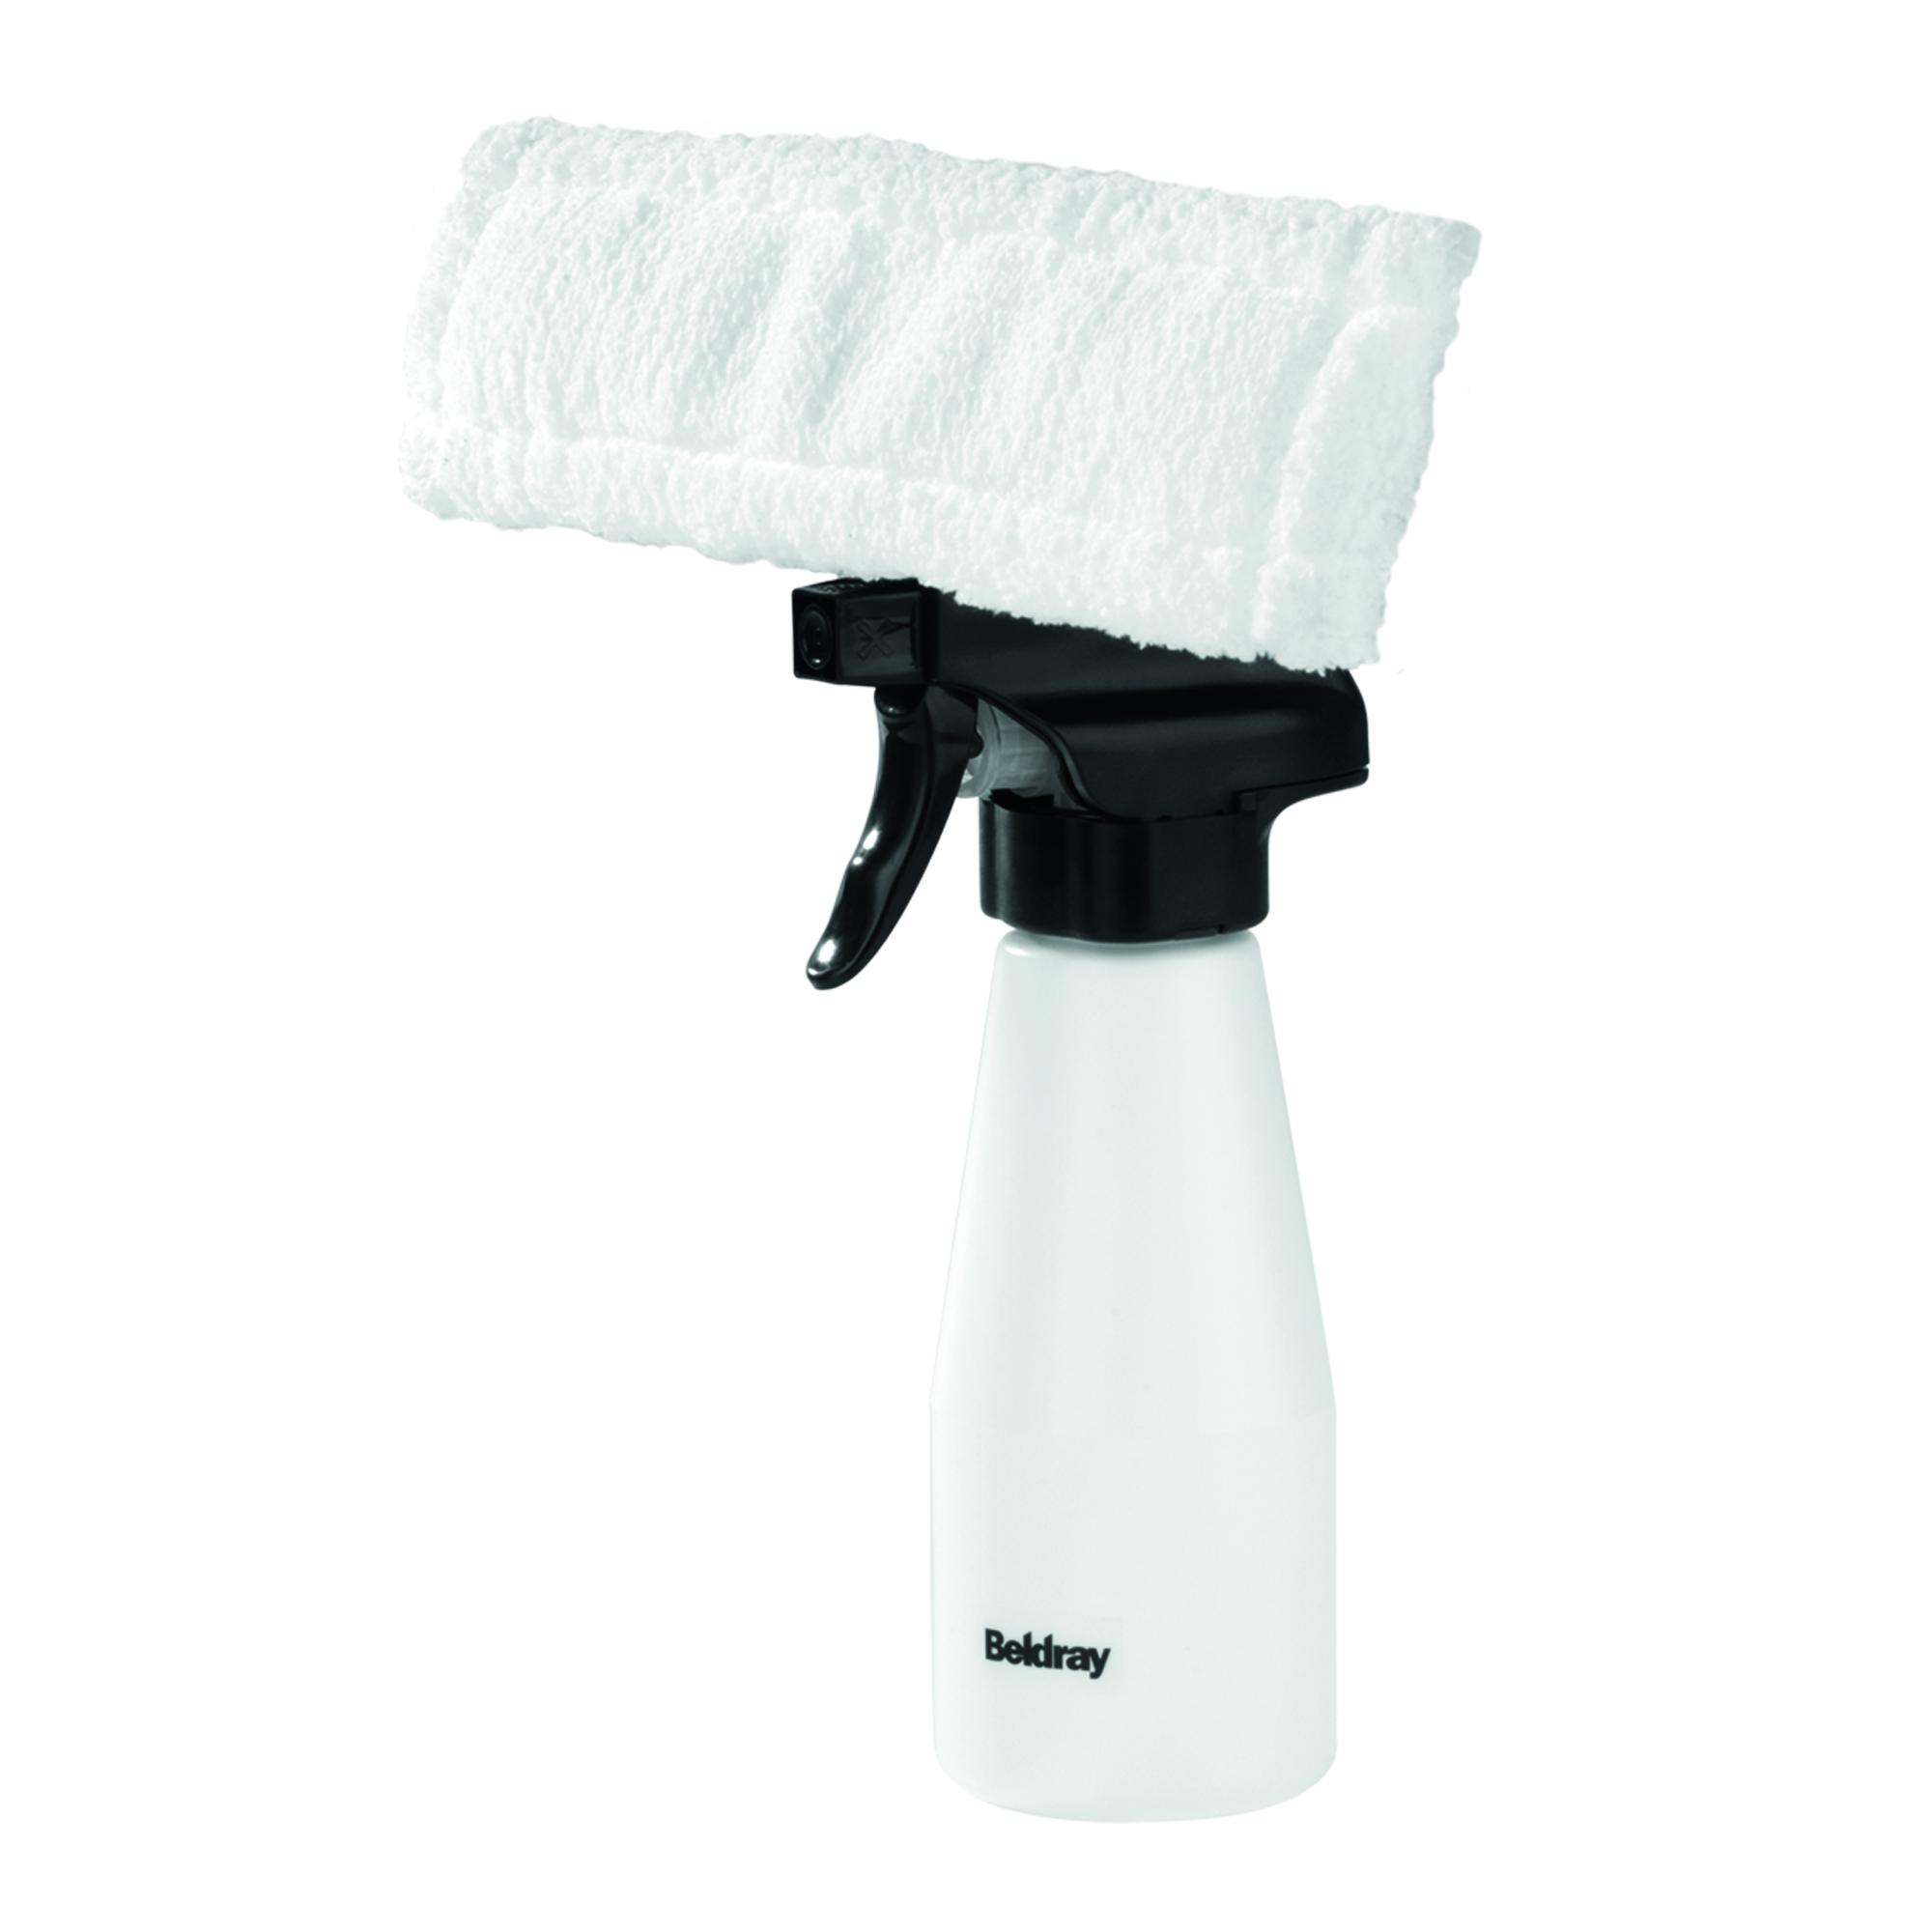 Beldray BEL0537 Rechargeable Window Vacuum Cleaner, Orange/White Thumbnail 5